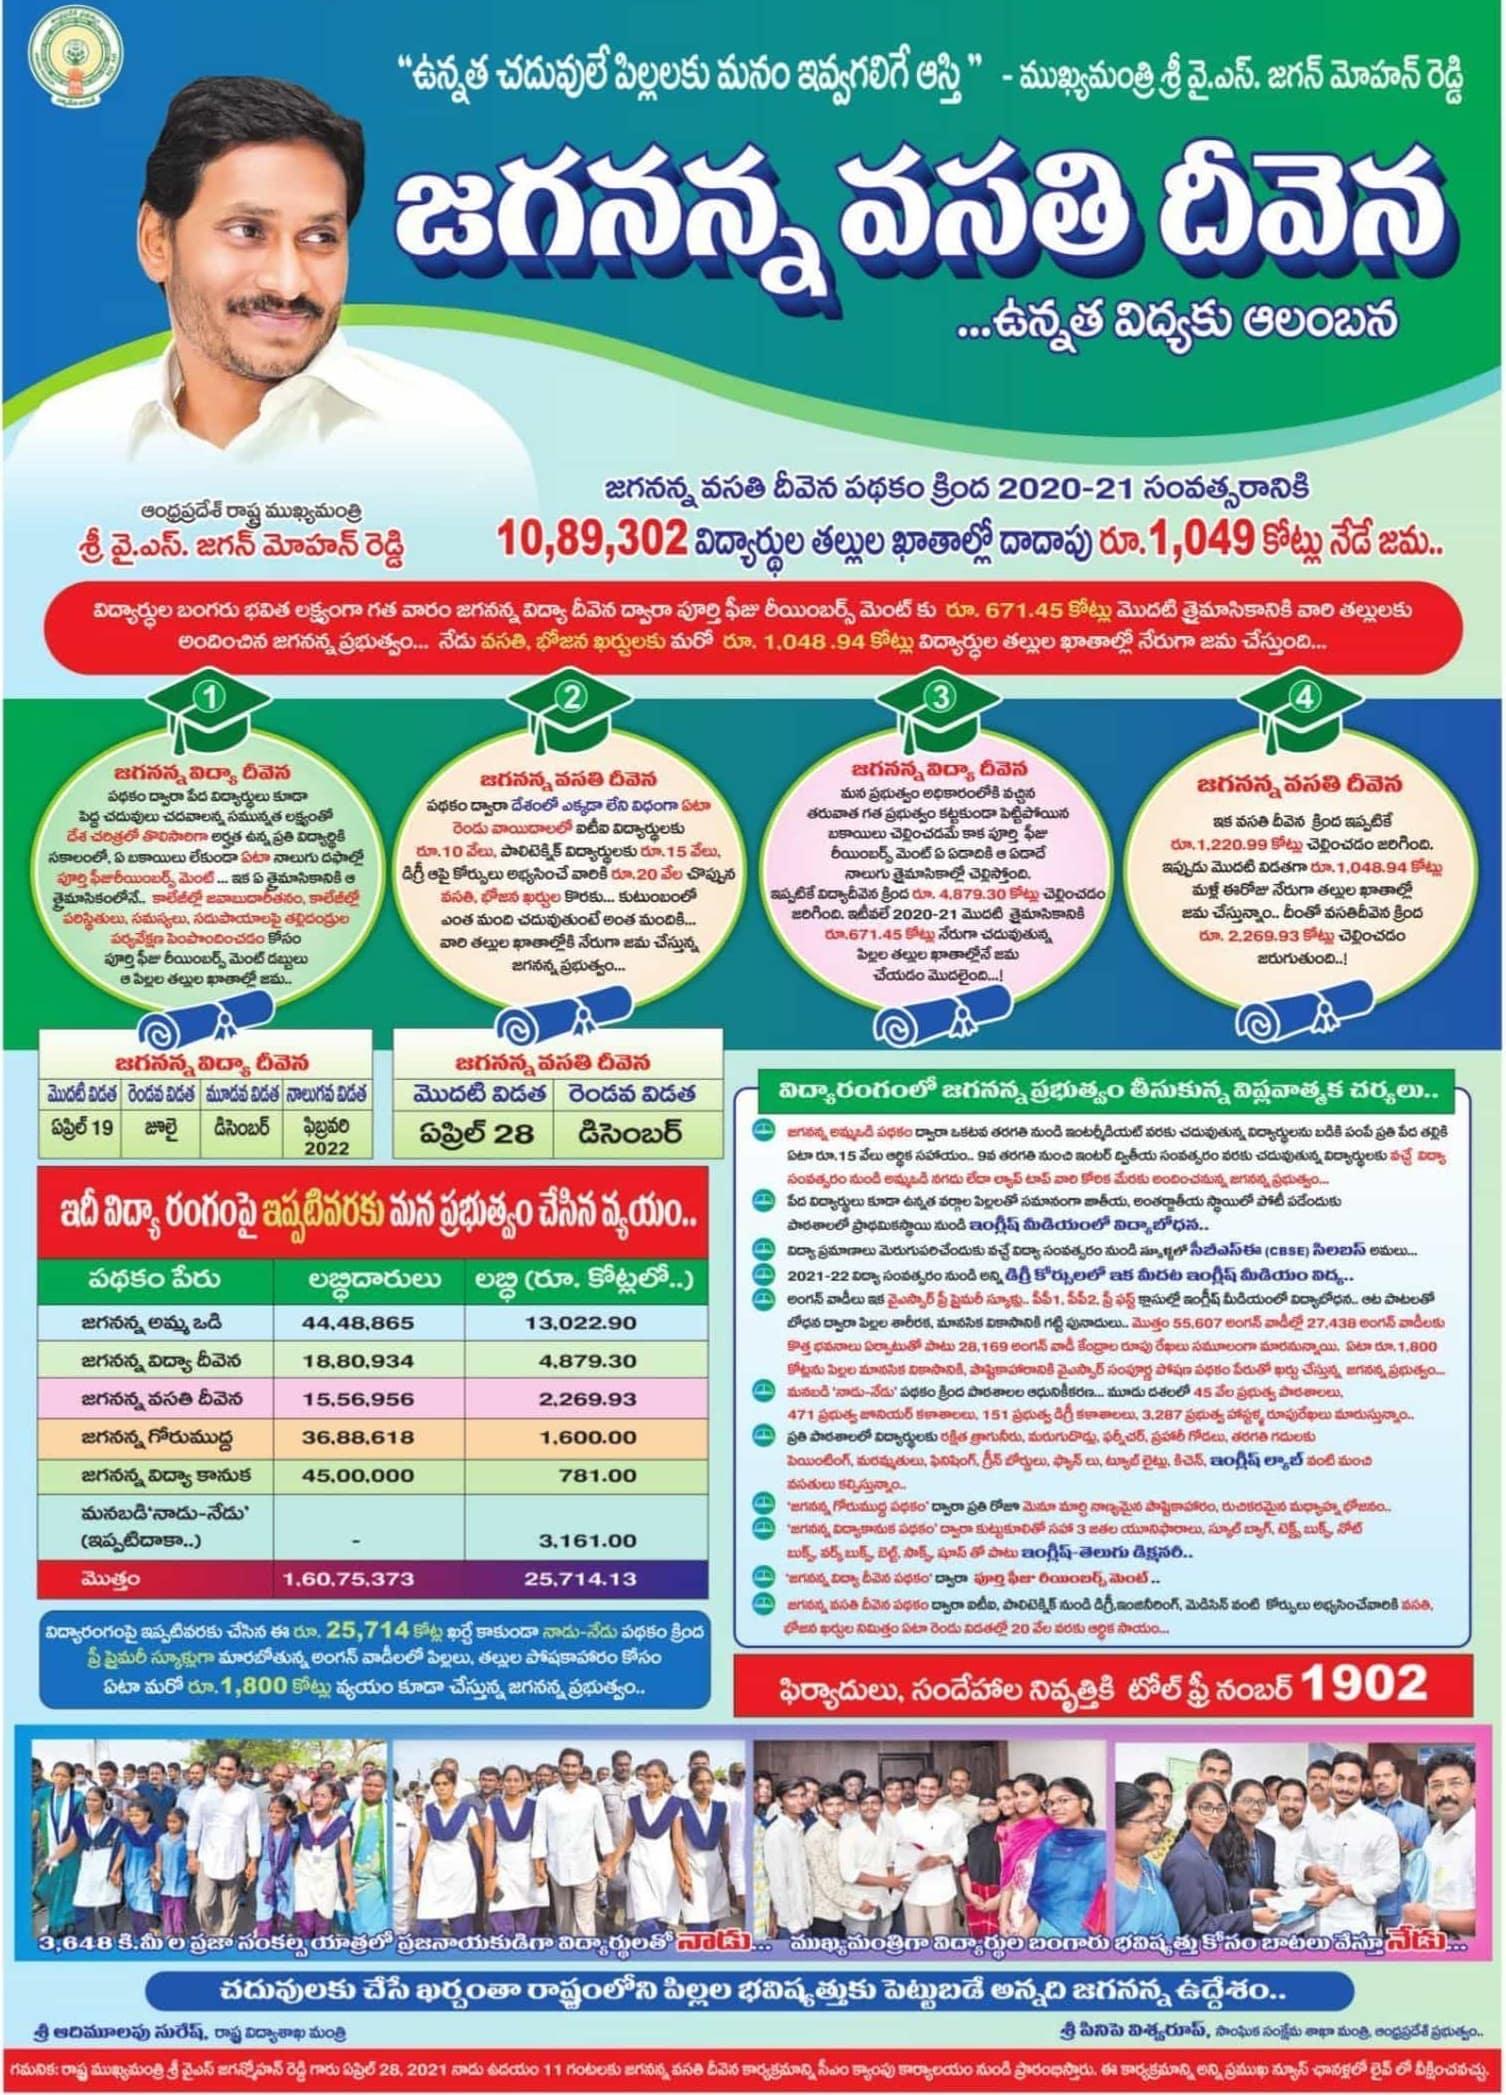 JVD-Jagananna-Vasathi-Deevena-Scheme-payment-details